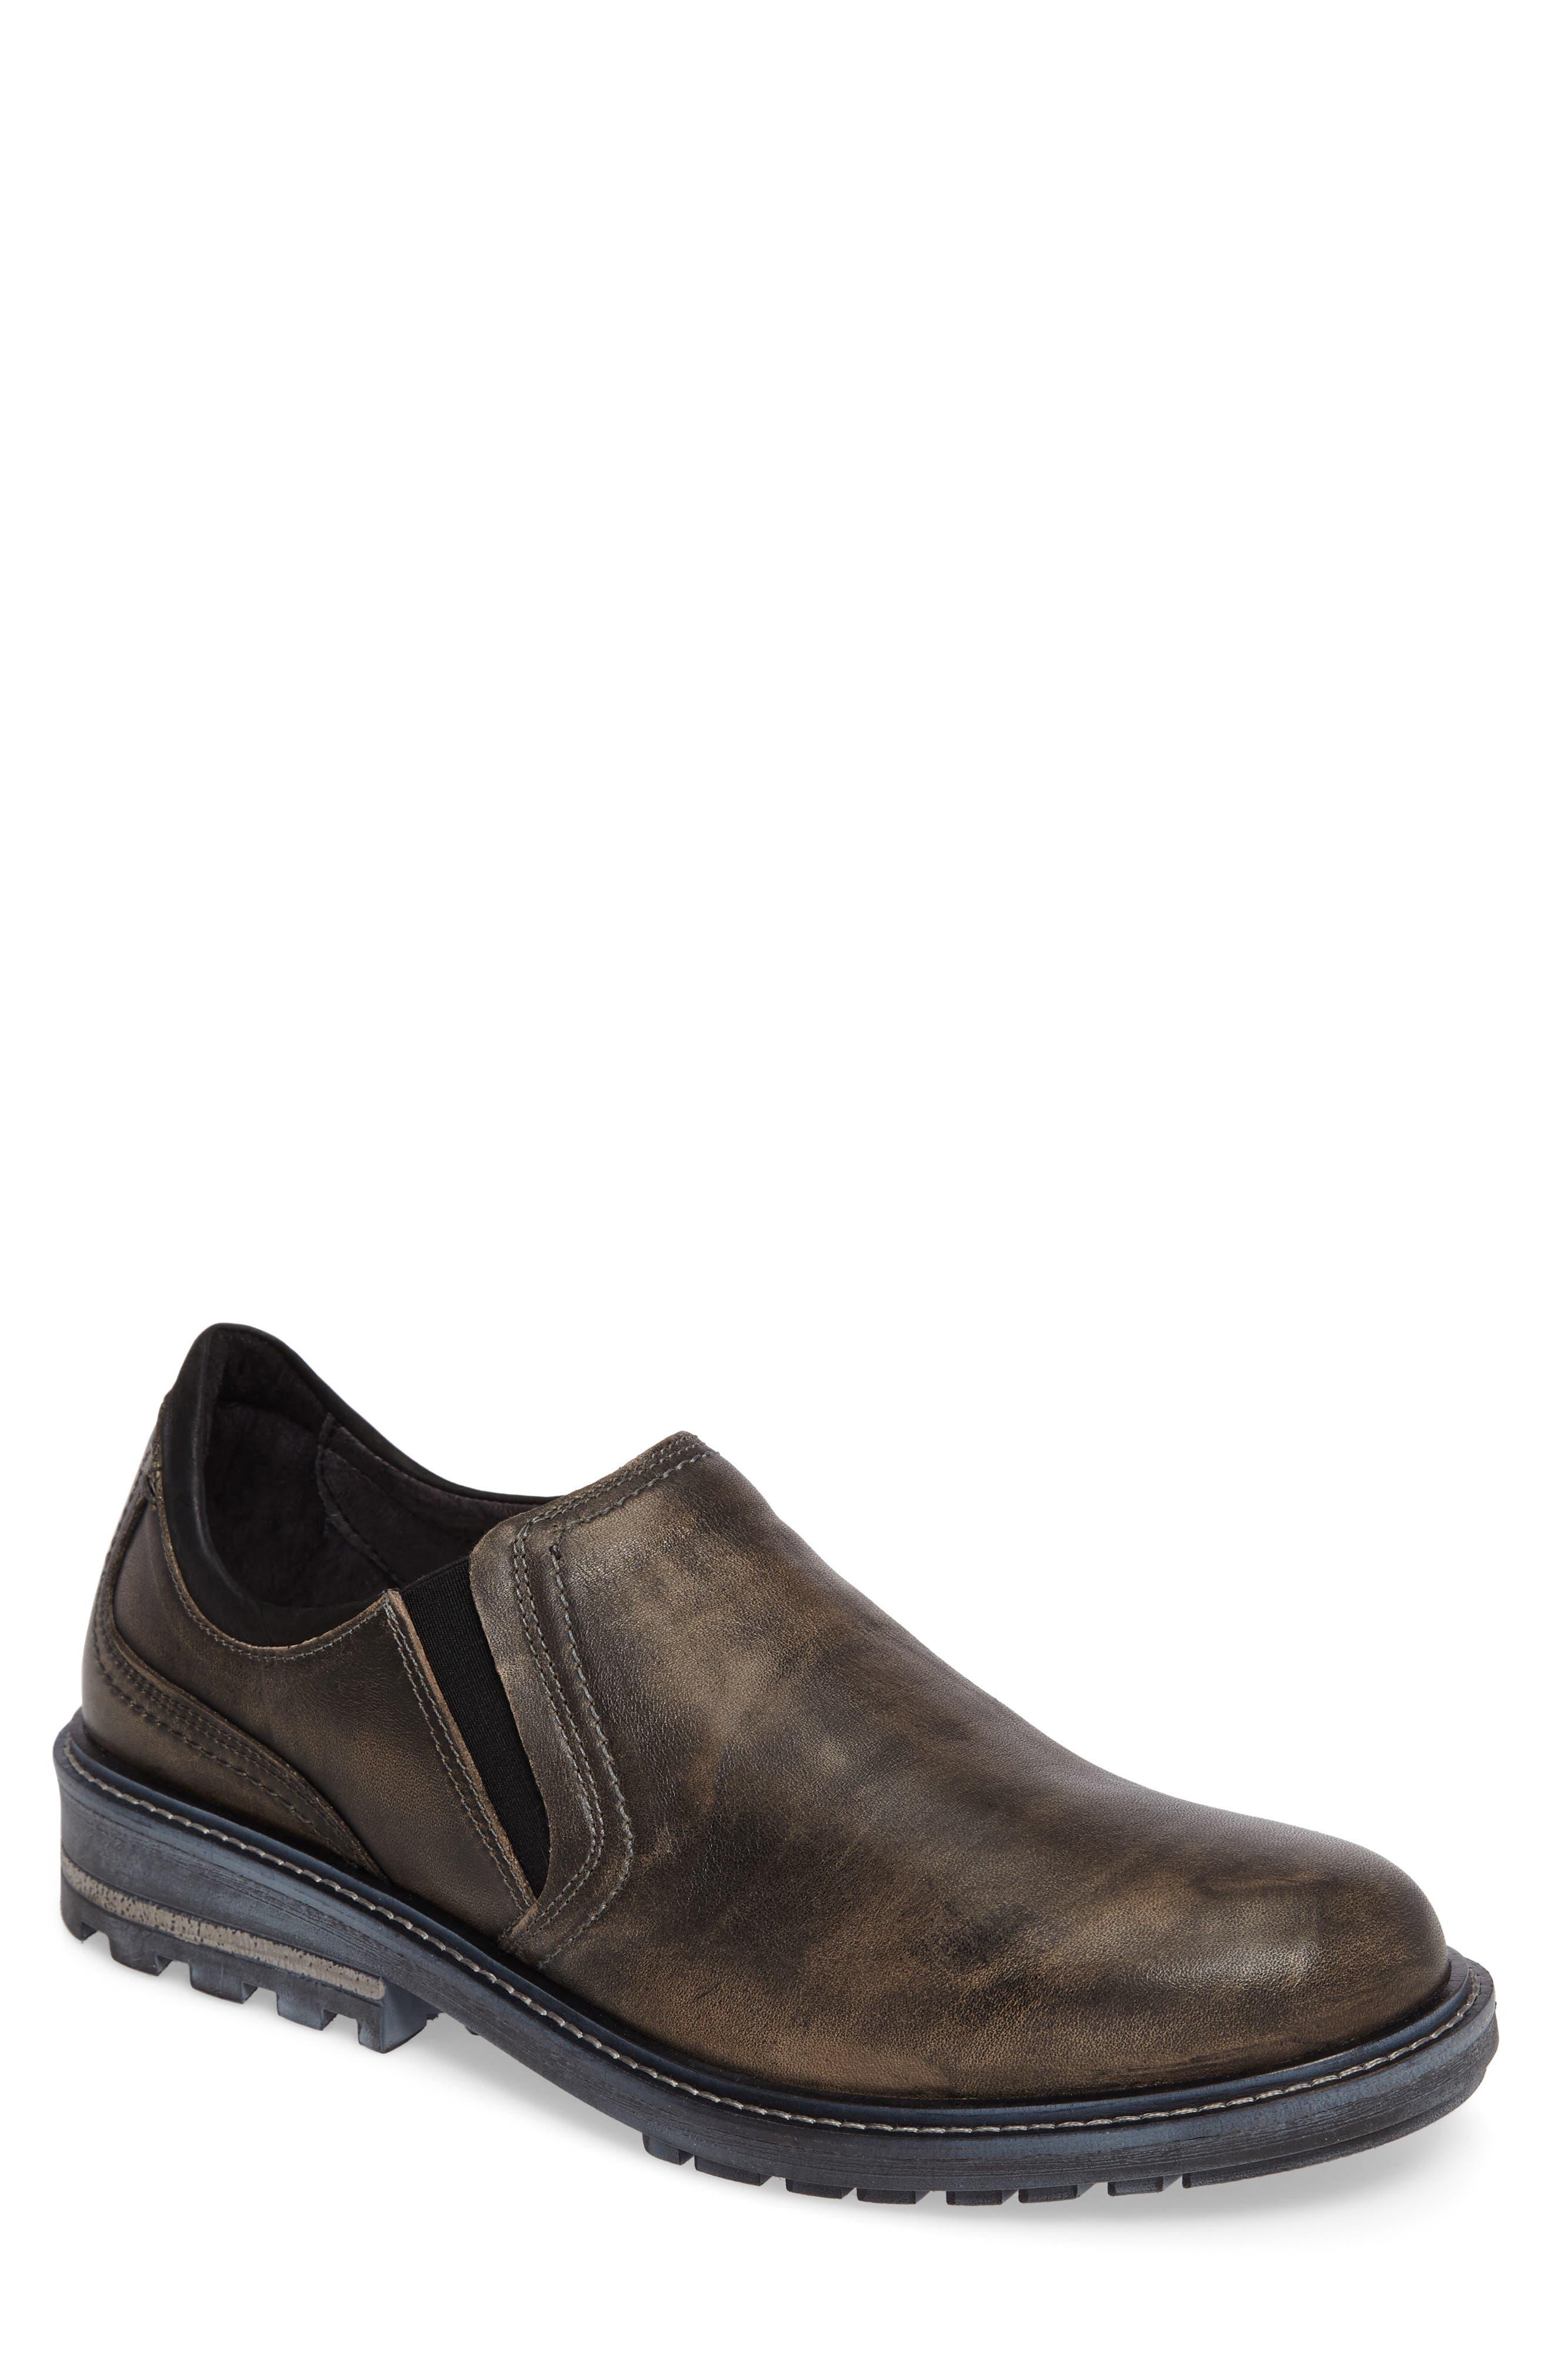 Manyara Slip-On Loafer,                             Main thumbnail 1, color,                             Vintage Grey Leather